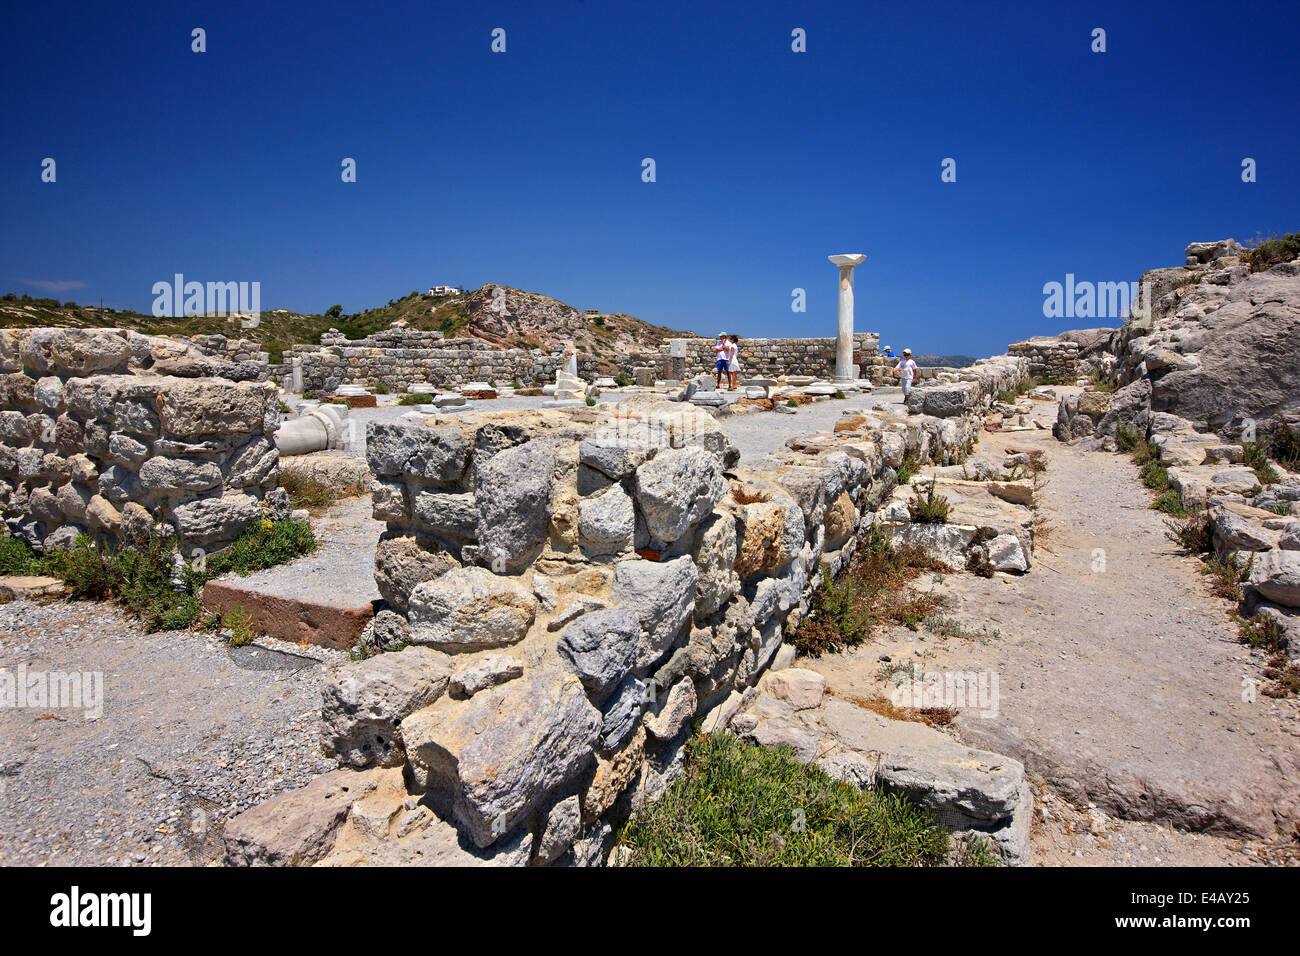 Ruins of an Early Christian Basilica at Agios Stephanos, Kefalos bay, Kos island, Dodecanese, Aegean sea, Greece. - Stock Image